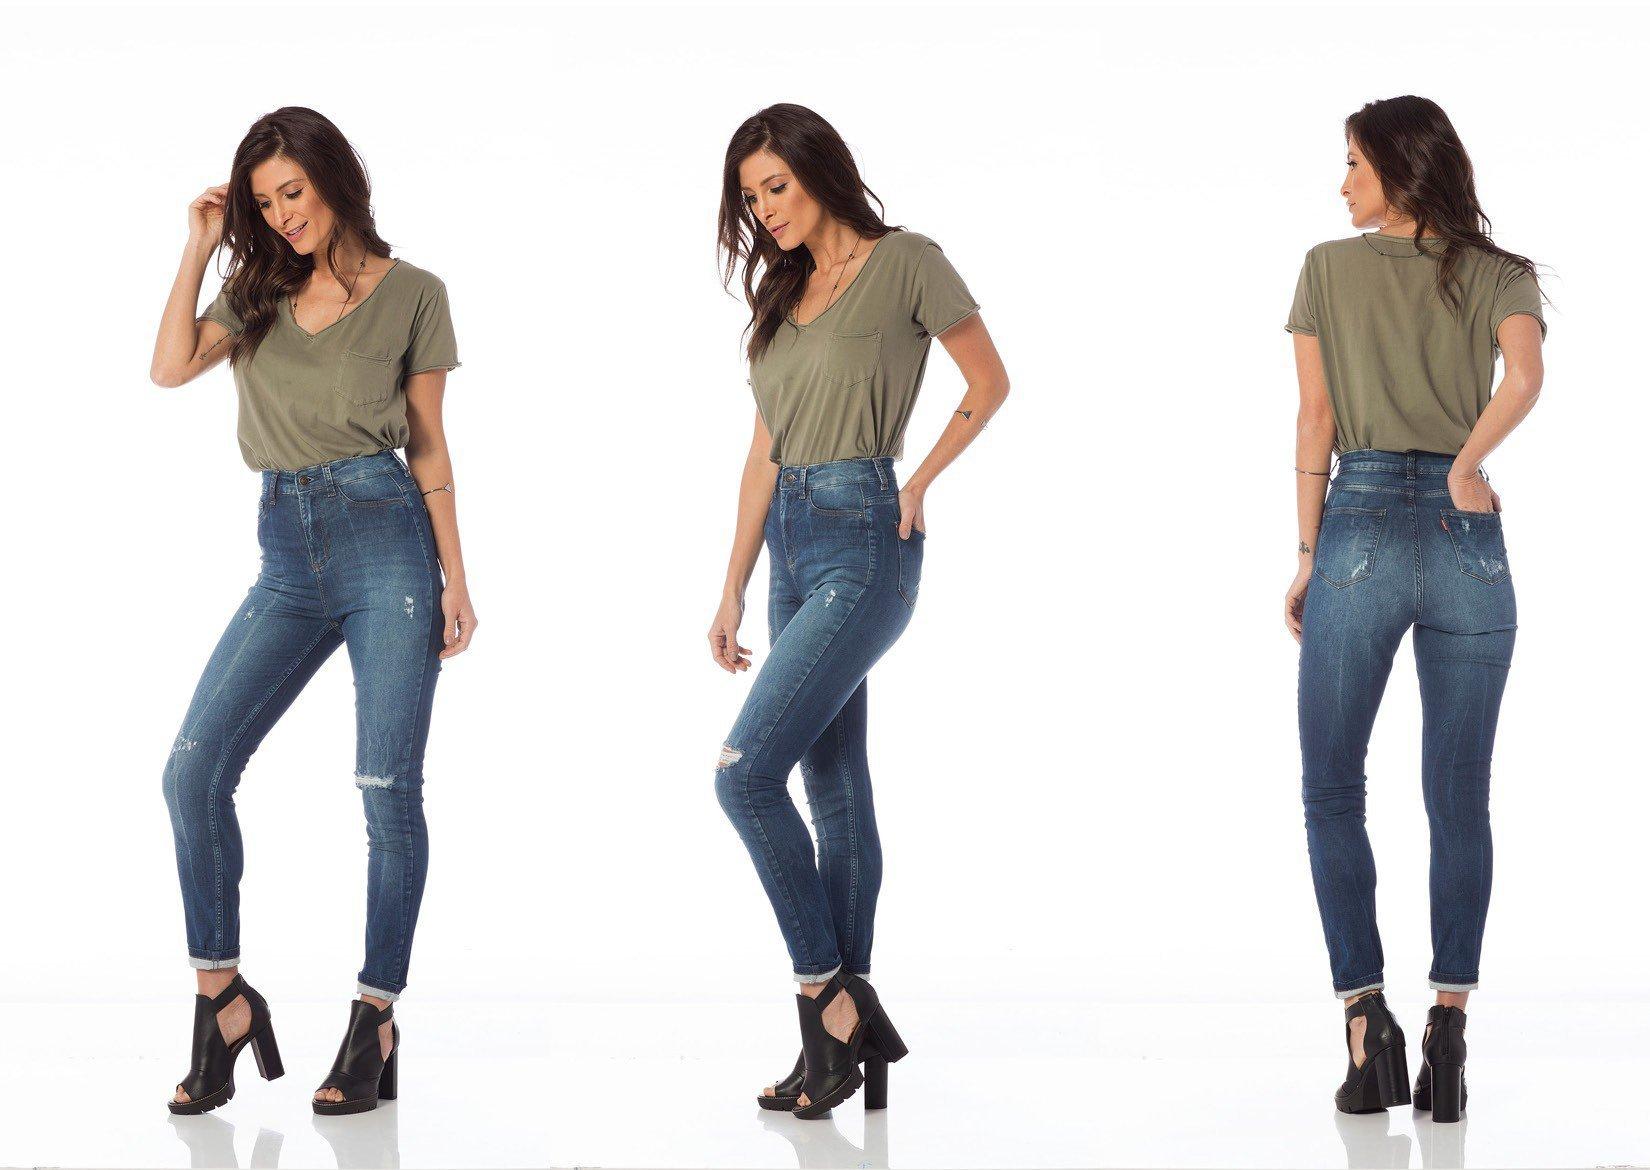 calca skinny hot pants com puidos dz2674 tripla denim zero